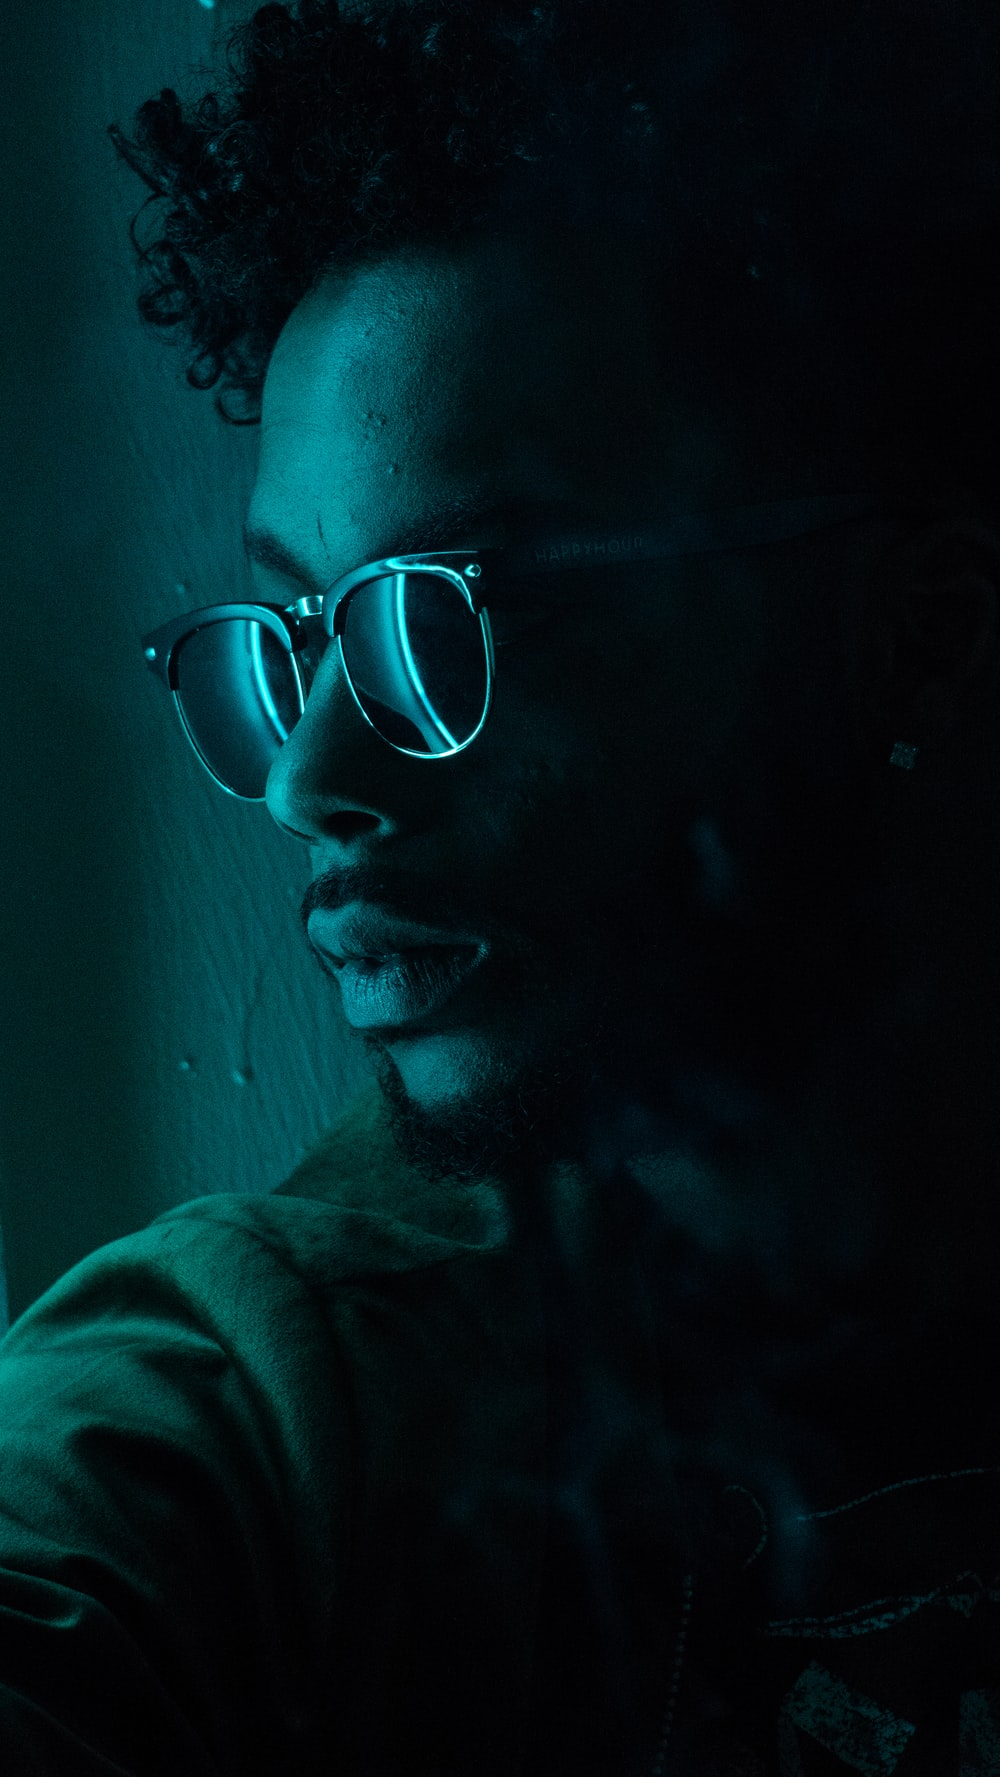 man sitting near wall wearing black framed sunglasses